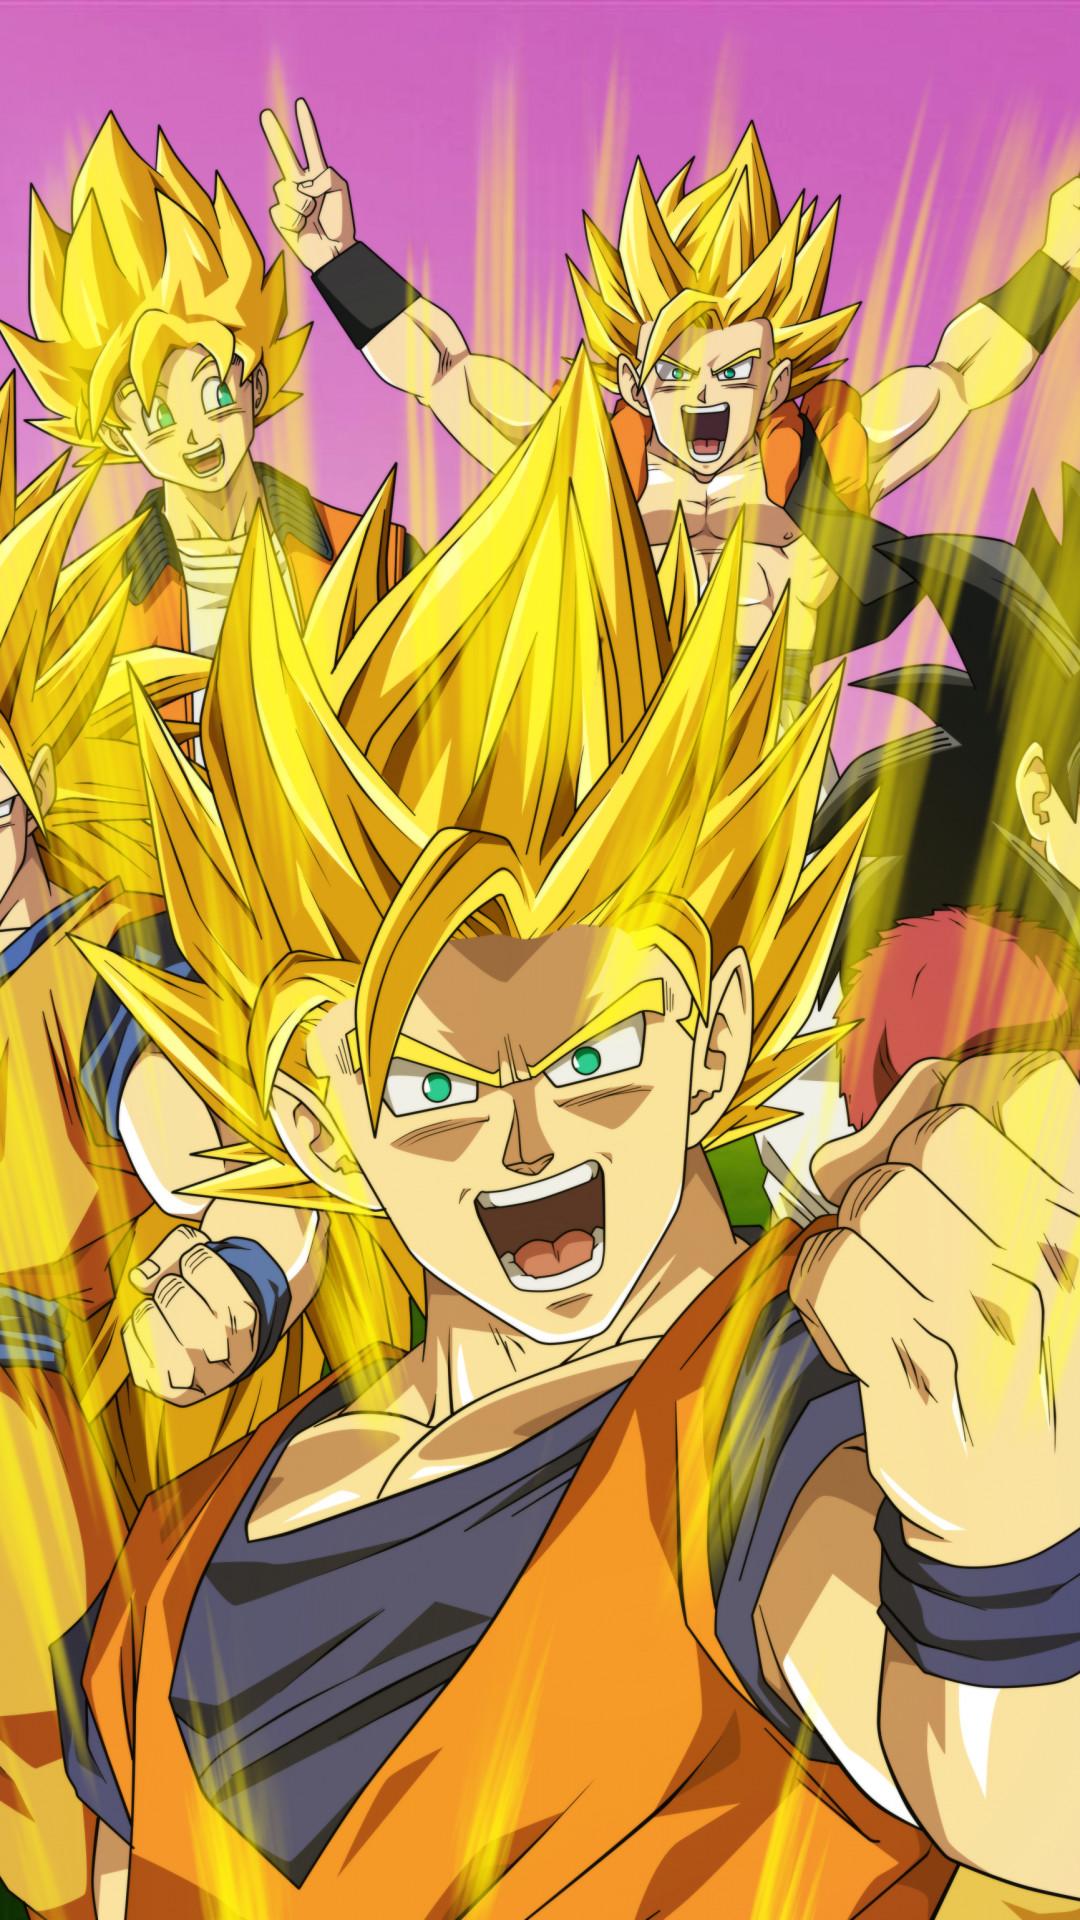 Dragon Ball Gt Wallpaper Hd 64 Images